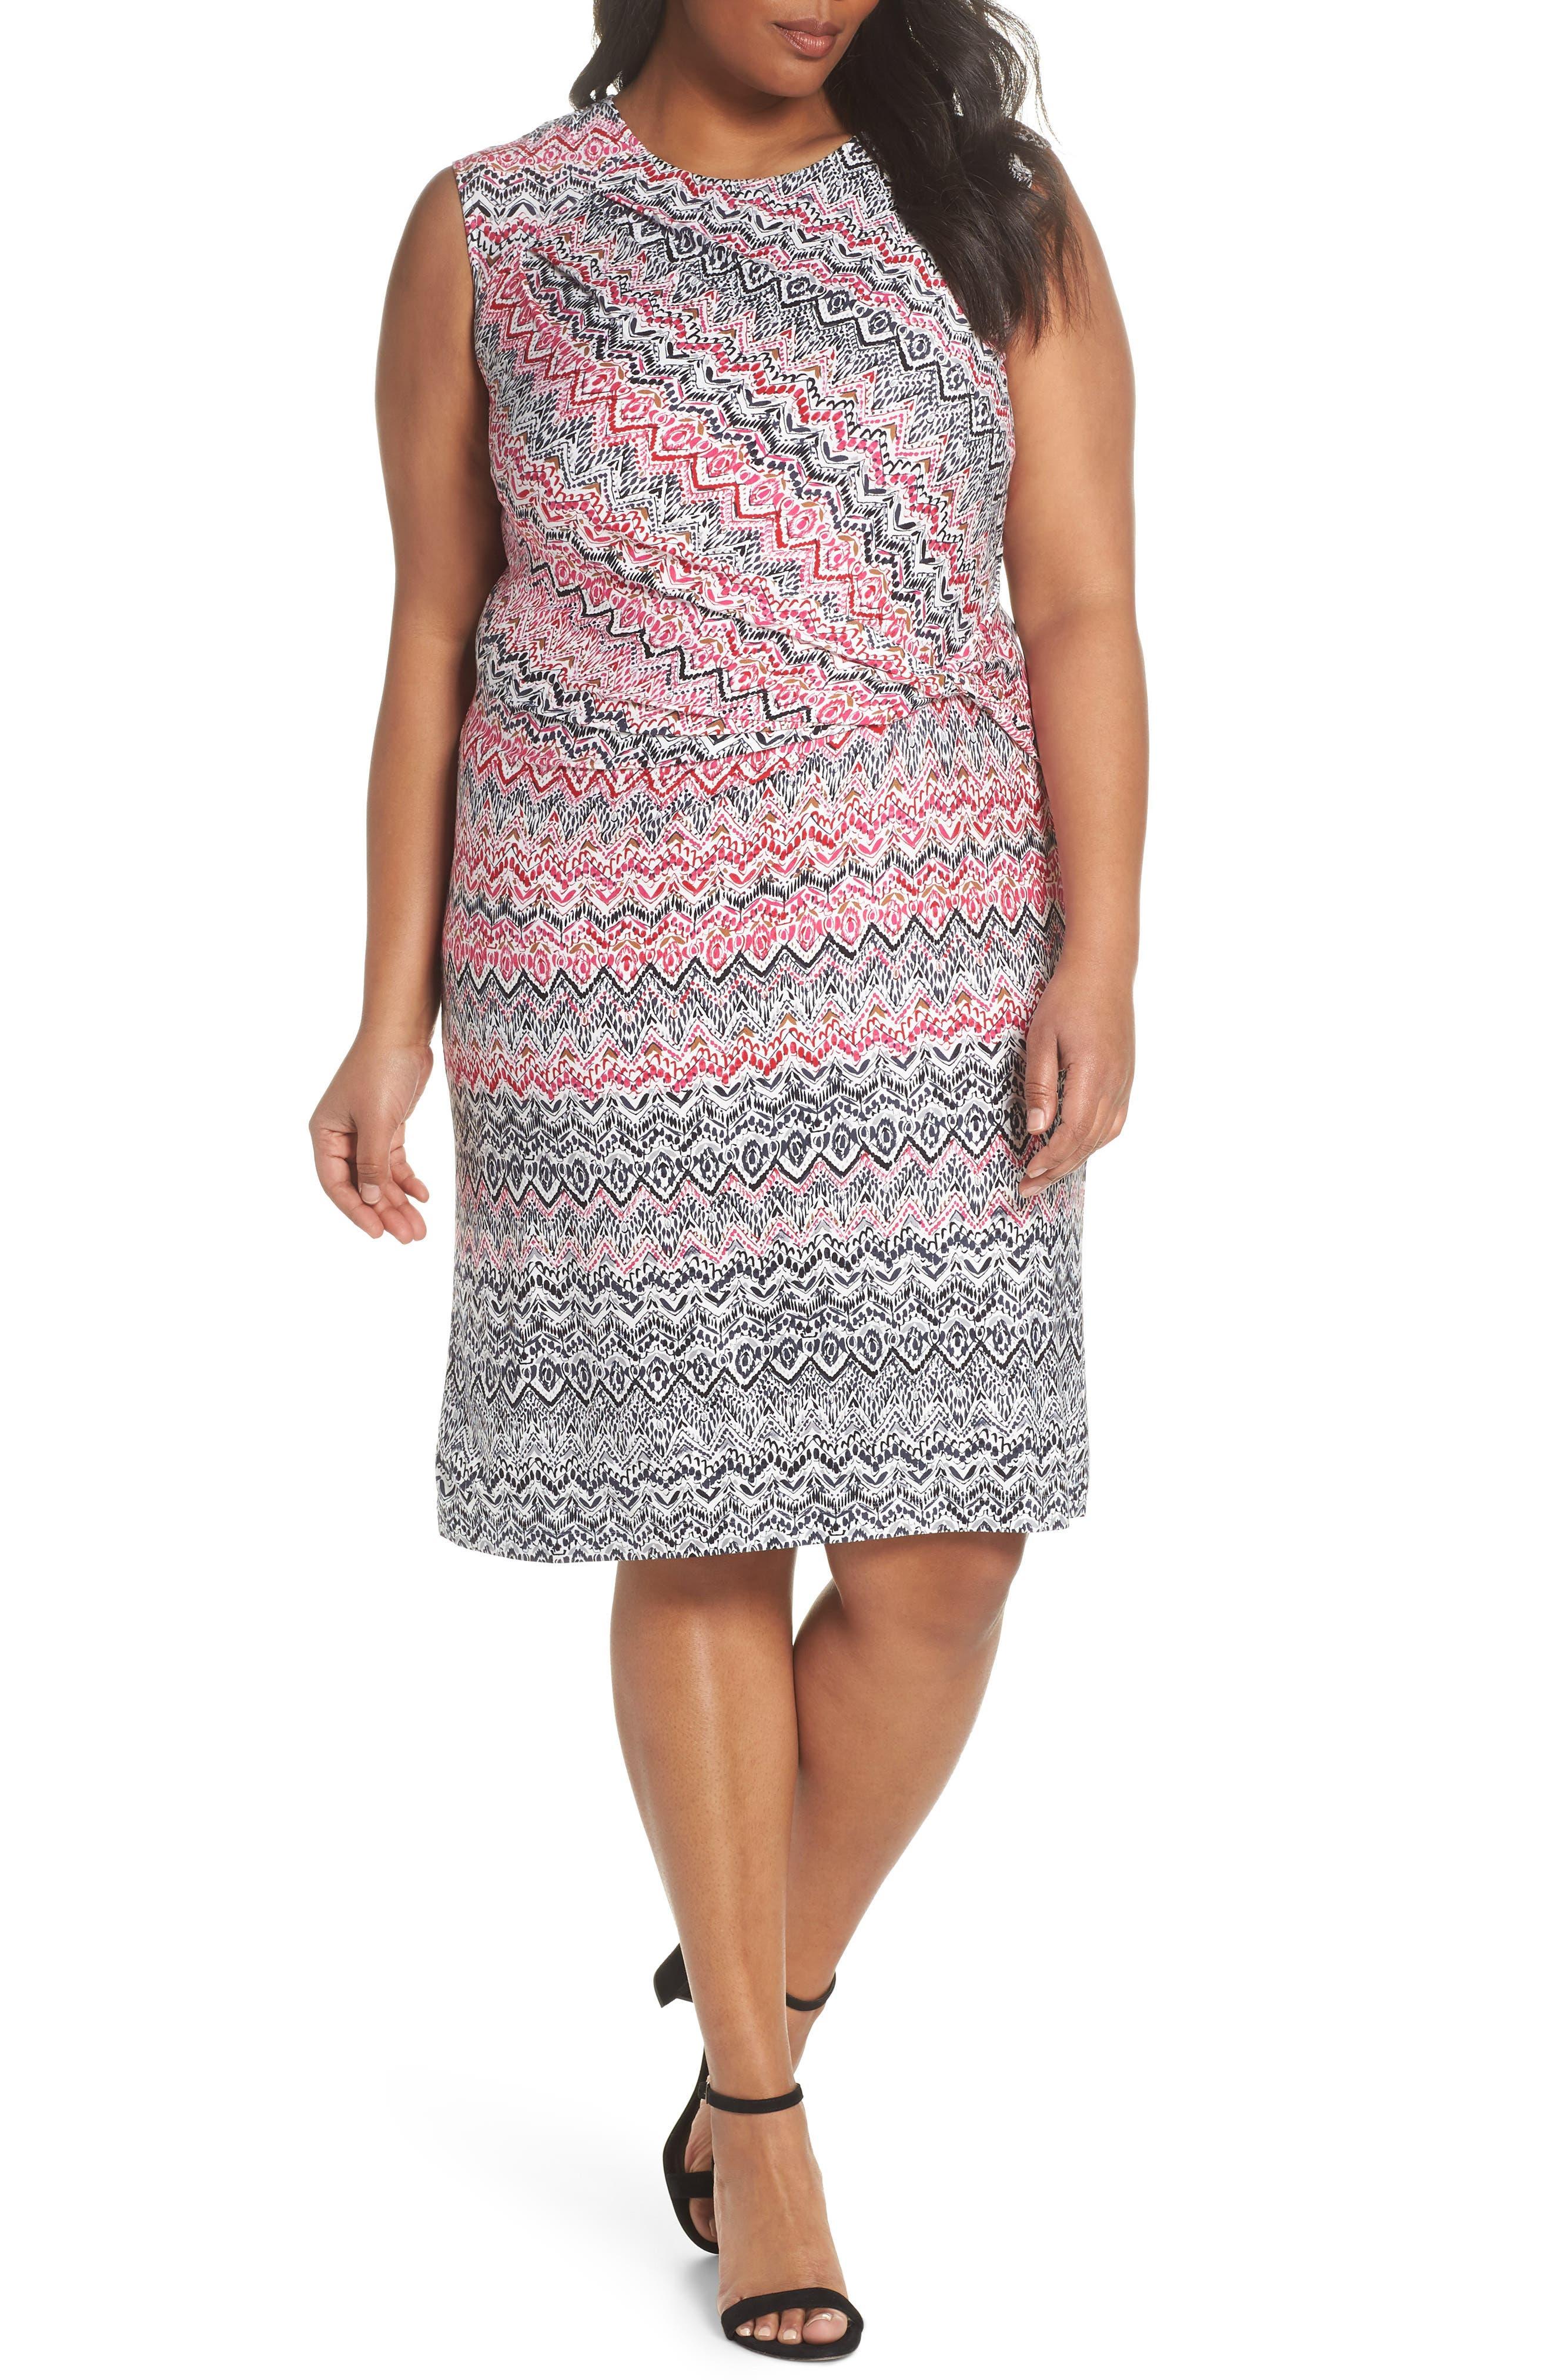 Alternate Image 1 Selected - NIC+ZOE Spiced Up Twist Sheath Dress (Plus Size)